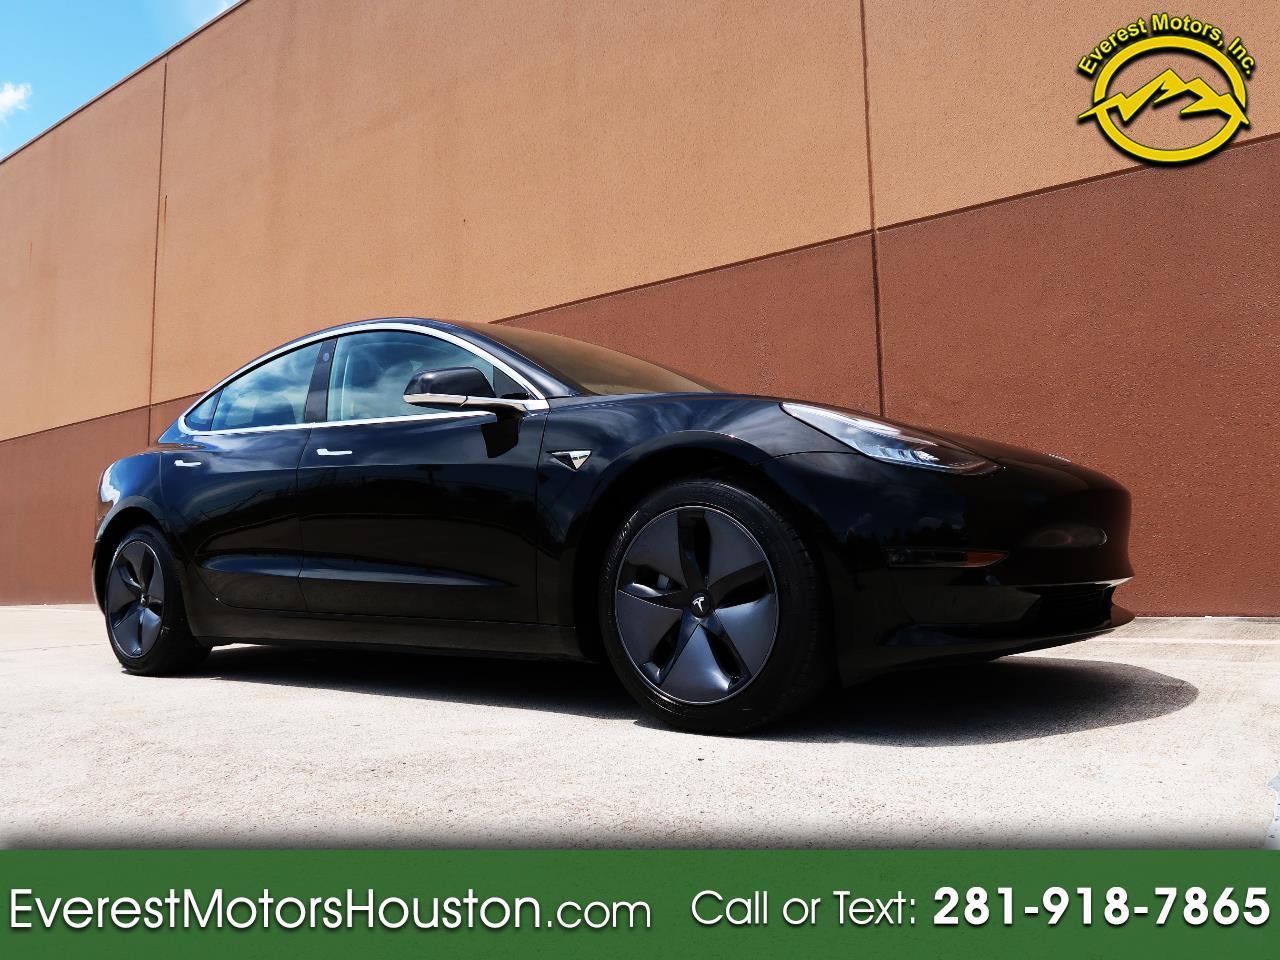 Used Car Auction - Car Export | AuctionXM